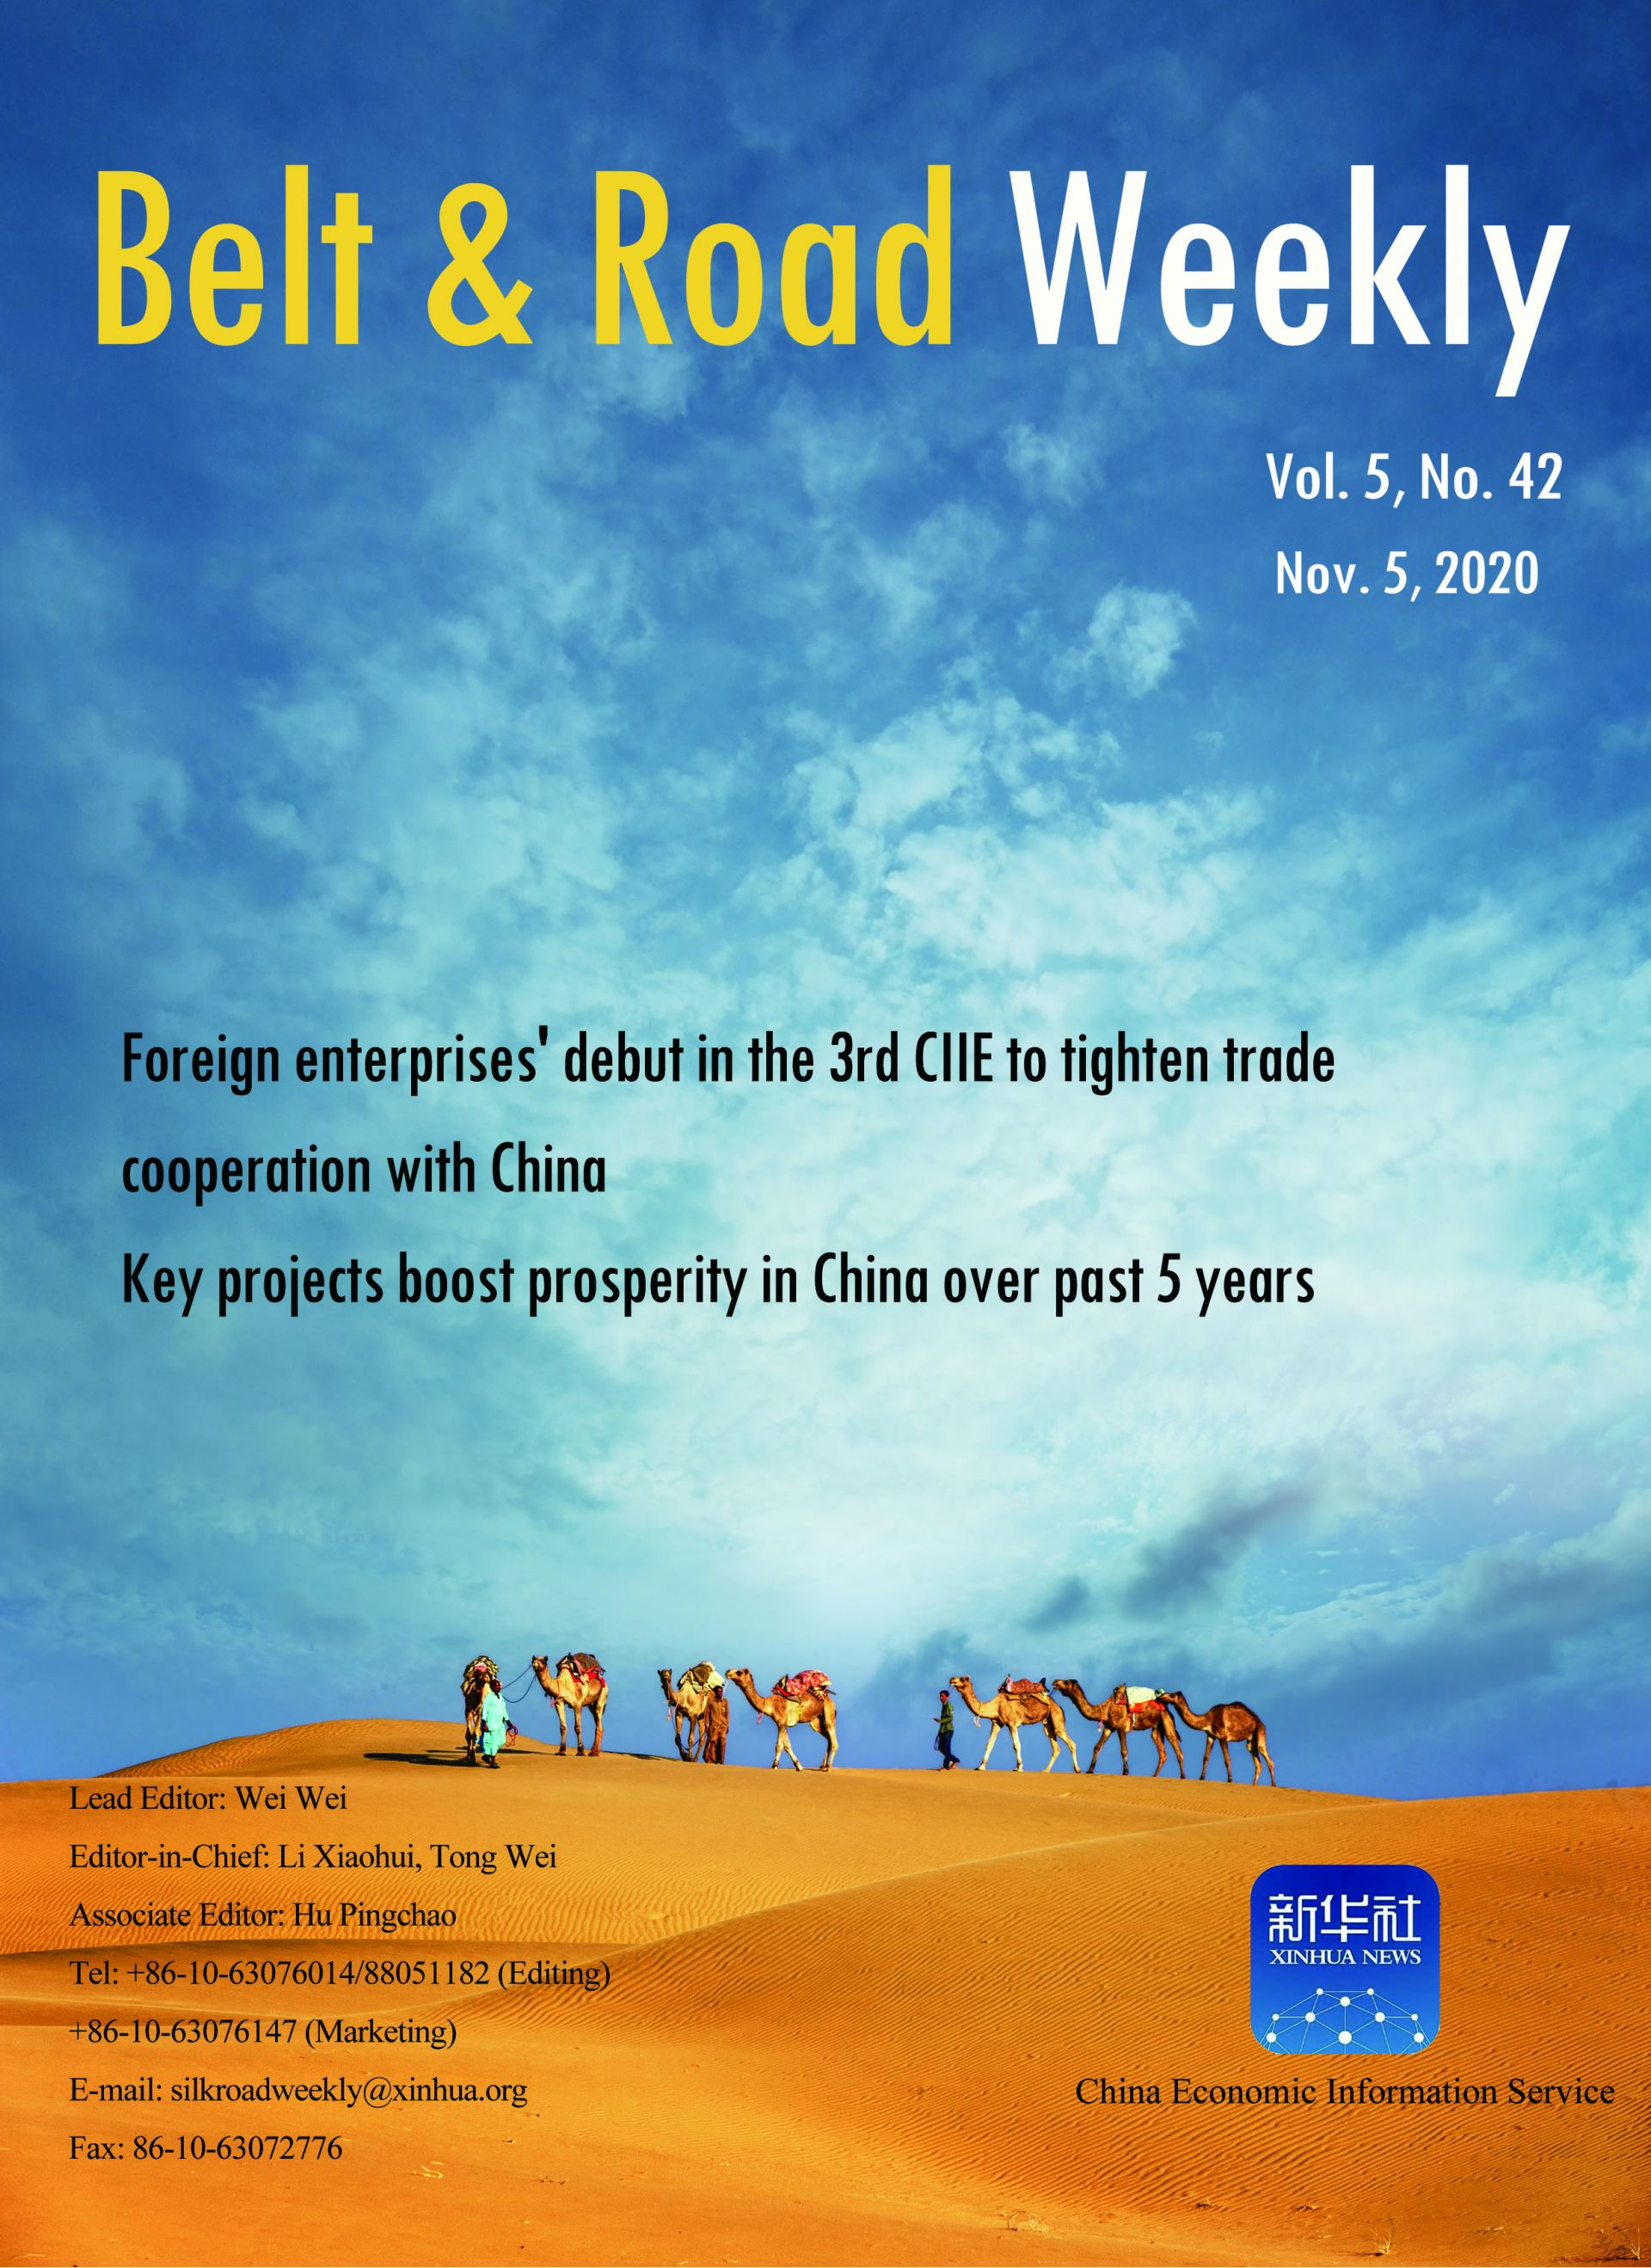 Belt and Road Weekly Vol. 5 No. 42